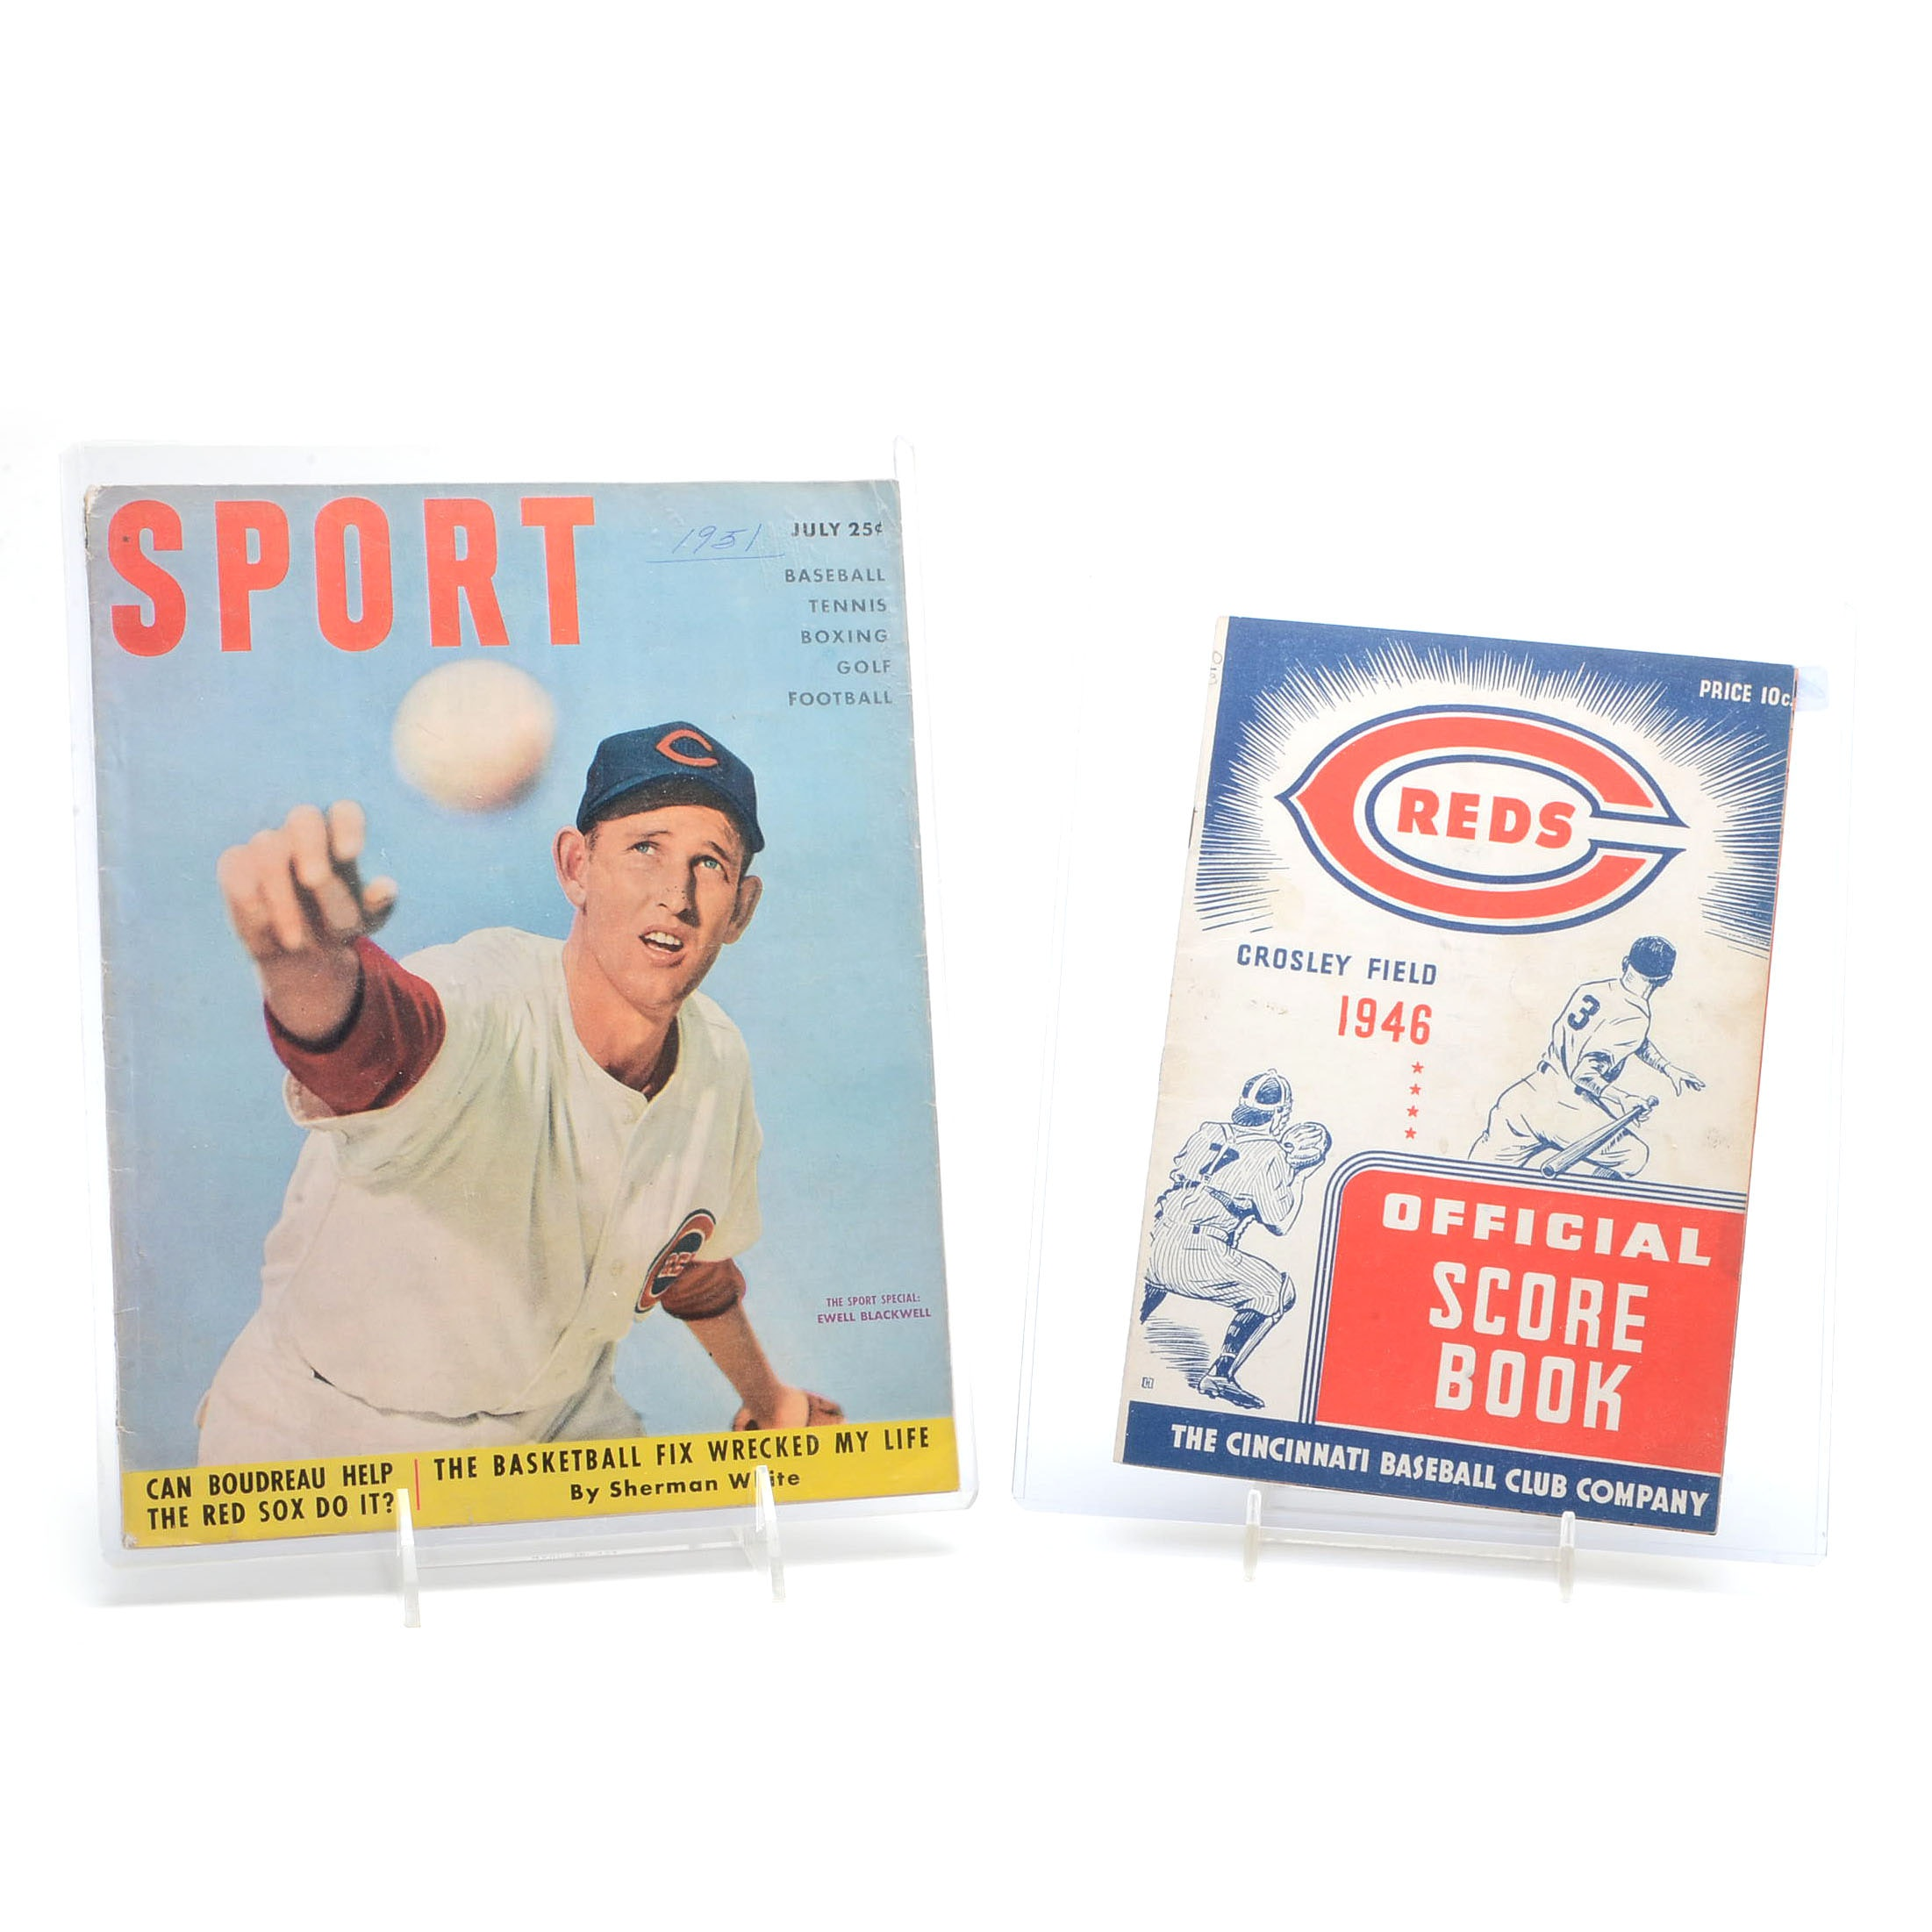 1946 Reds Scorecard and a 1951 Sports Magazine